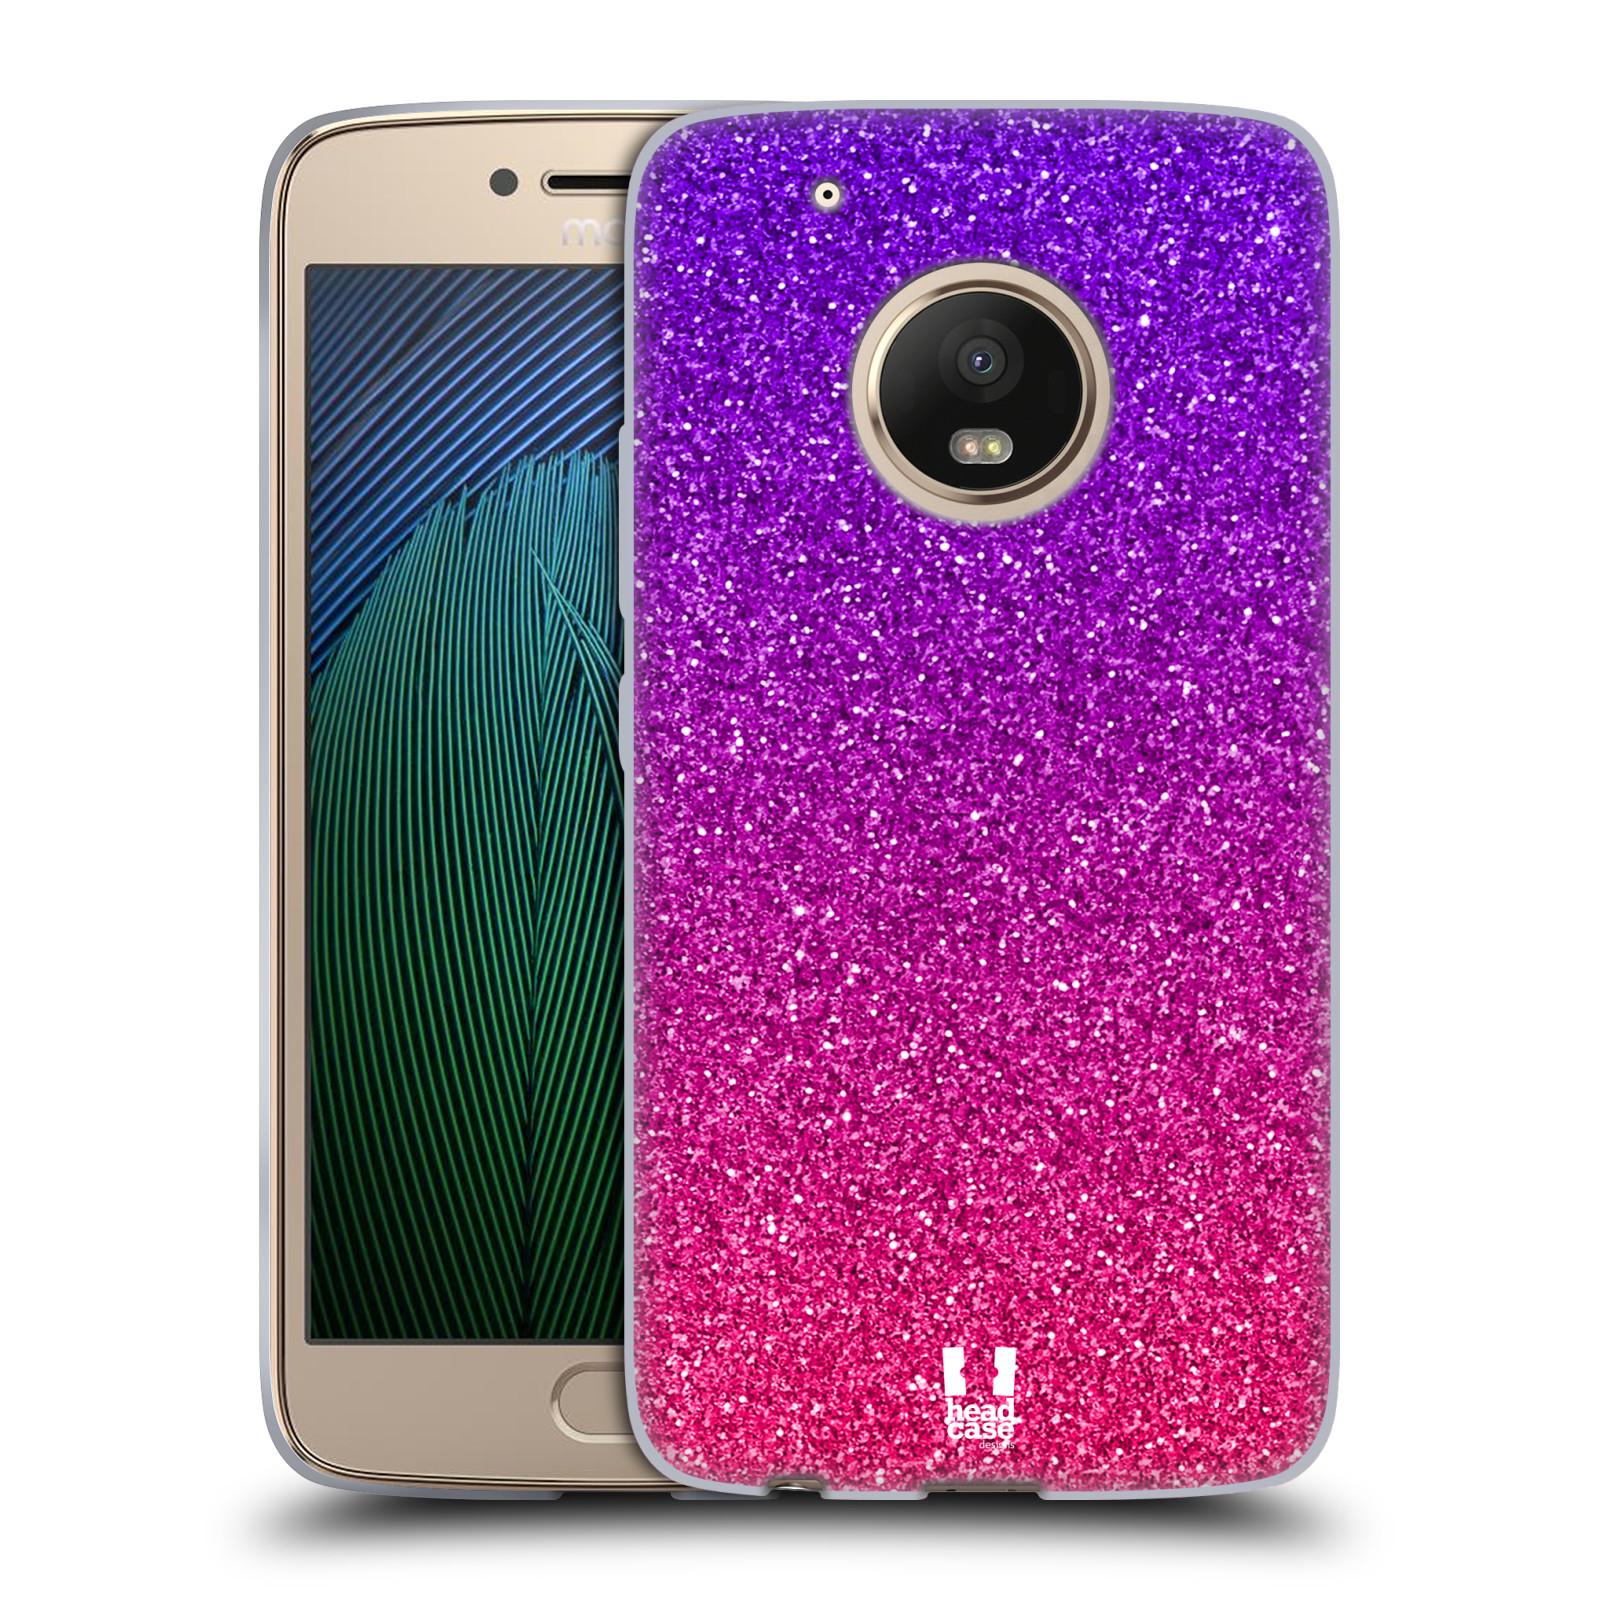 Silikonové pouzdro na mobil Lenovo Moto G5 Plus - Head Case MIX PINK (Silikonový kryt či obal na mobilní telefon Lenovo Moto G5 Plus)